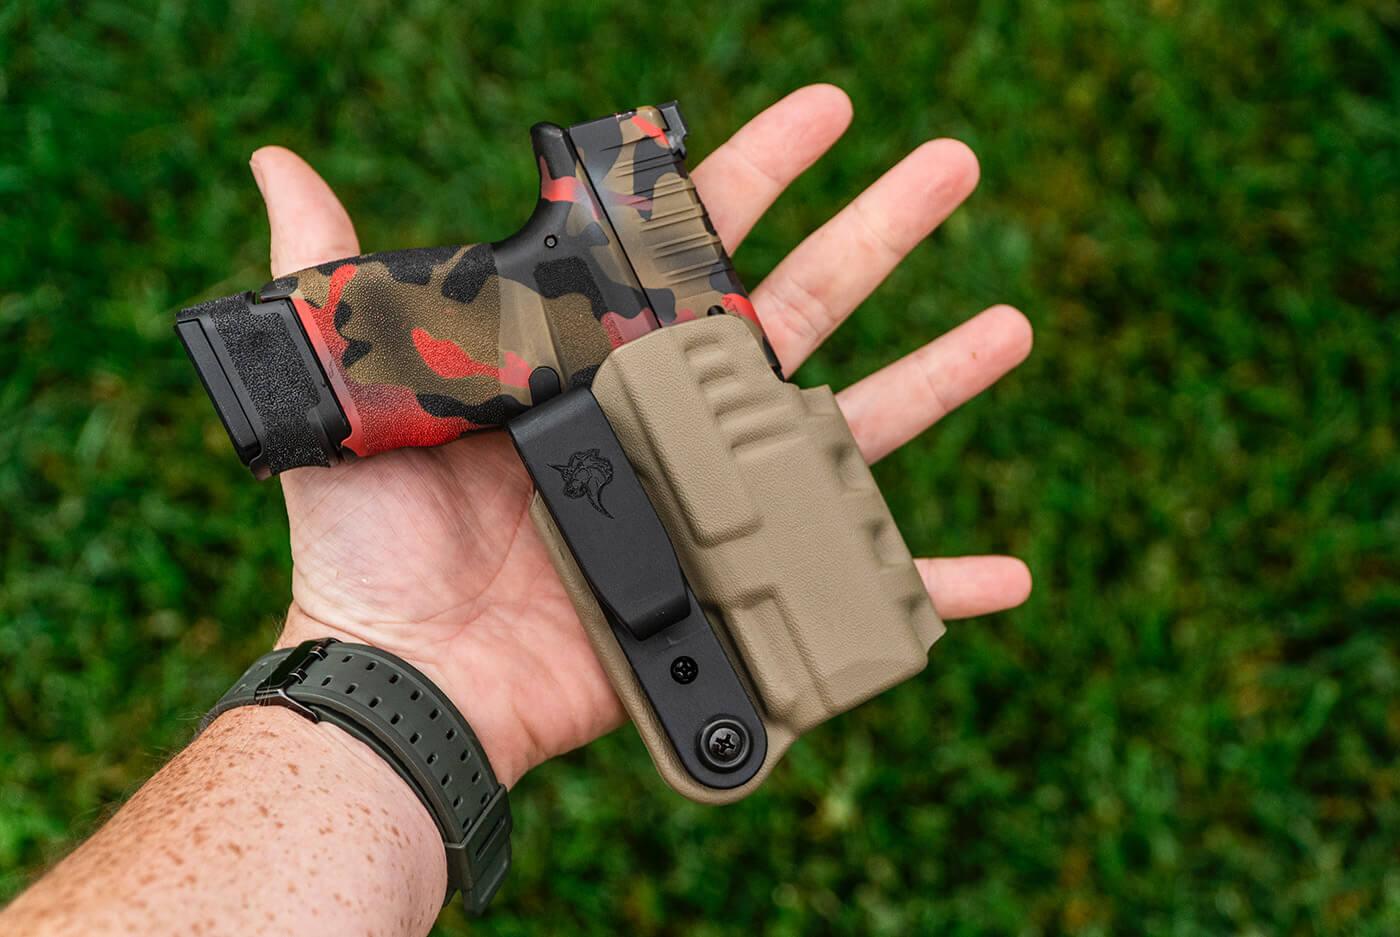 DeSantis FDE Slim-Tuk holster with customized Hellcat 9mm pistol